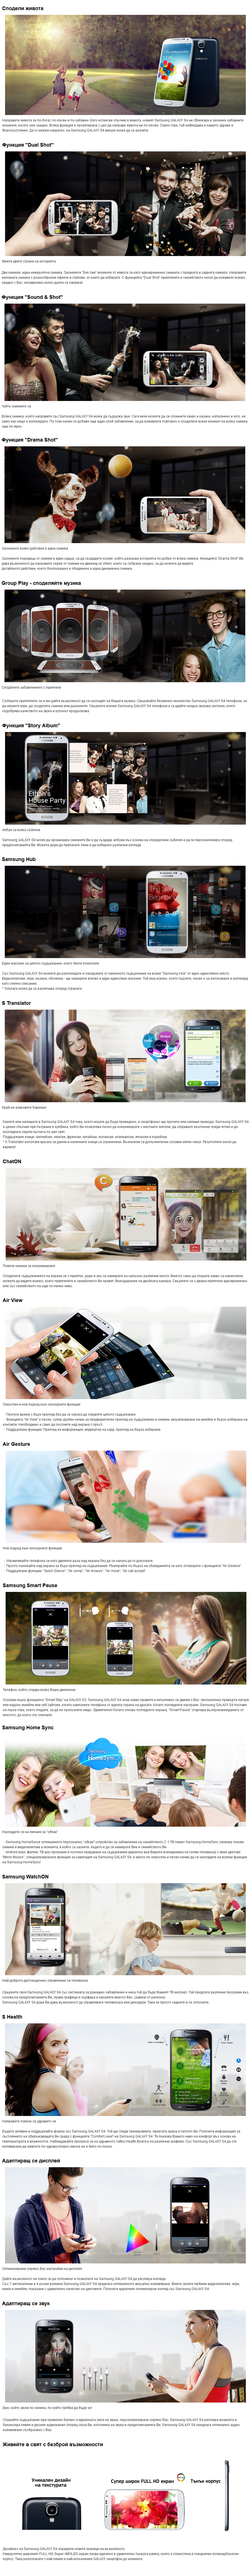 Samsung I9505 Galaxy S4 Black